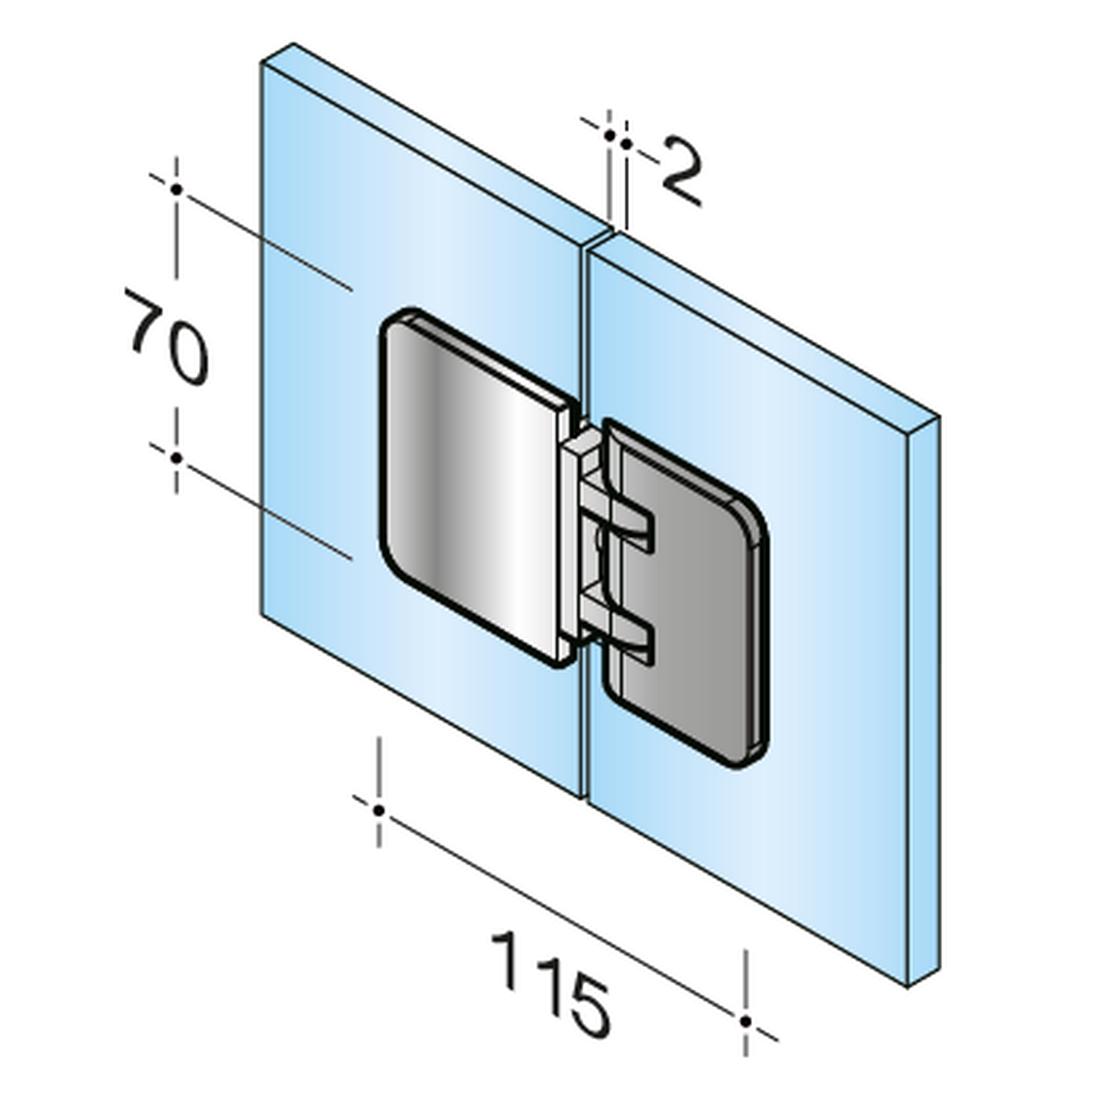 SWING PICCOLO 180° - DOOR HINGE I GLASS - GLASS